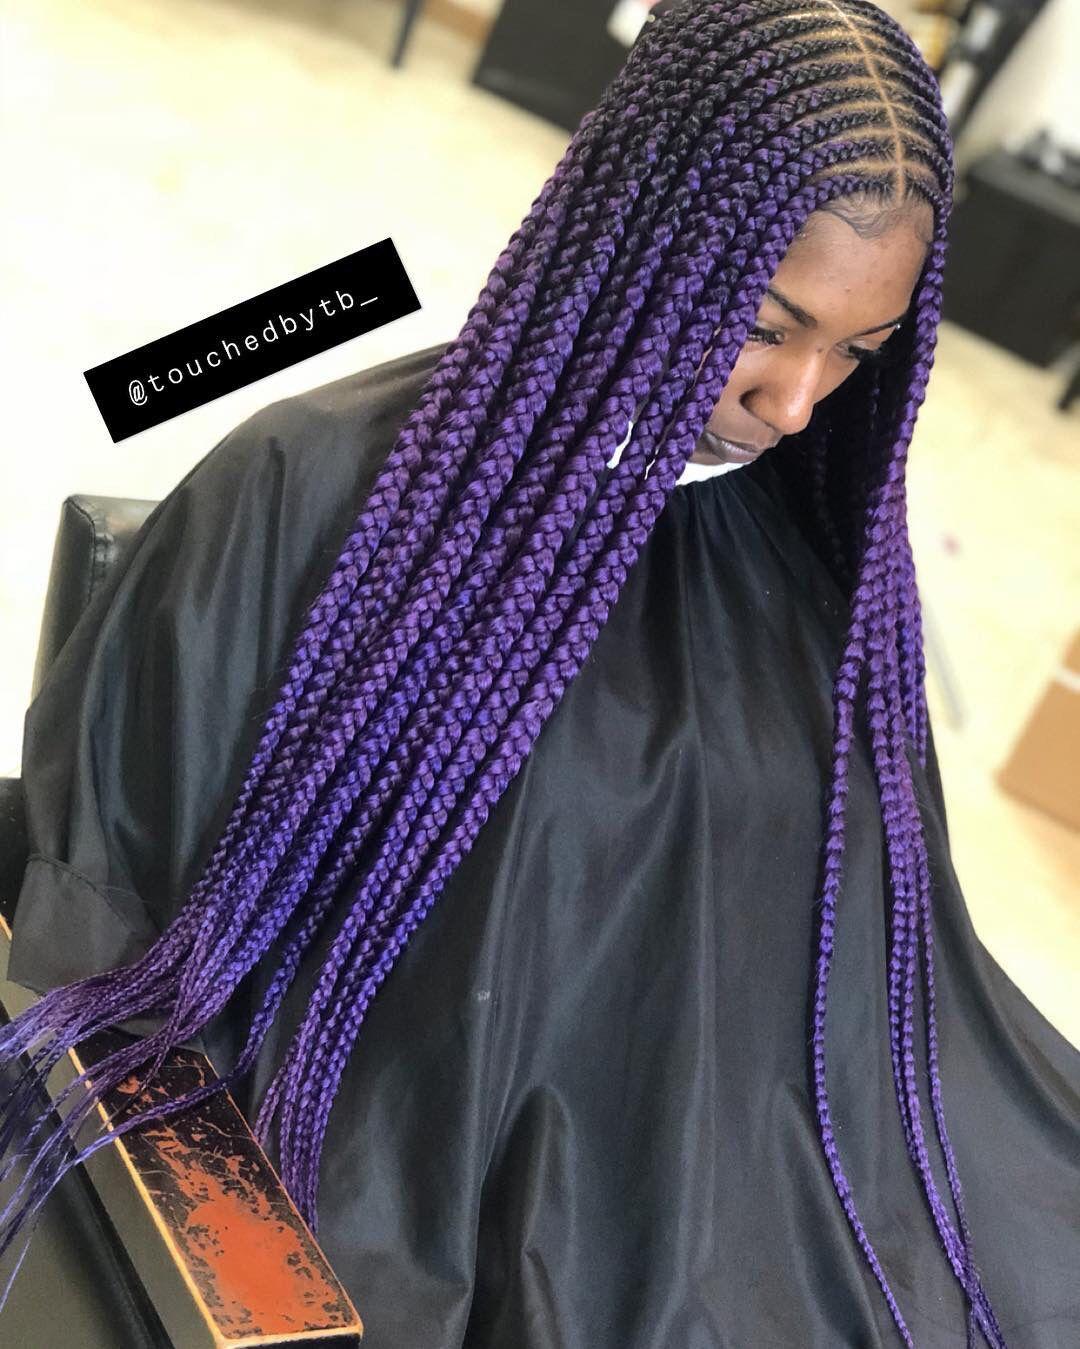 Pin By Sweet Sour On H A I R S L A Y E D Hair Styles Braided Hairstyles For Black Women Cornrows African Braids Hairstyles